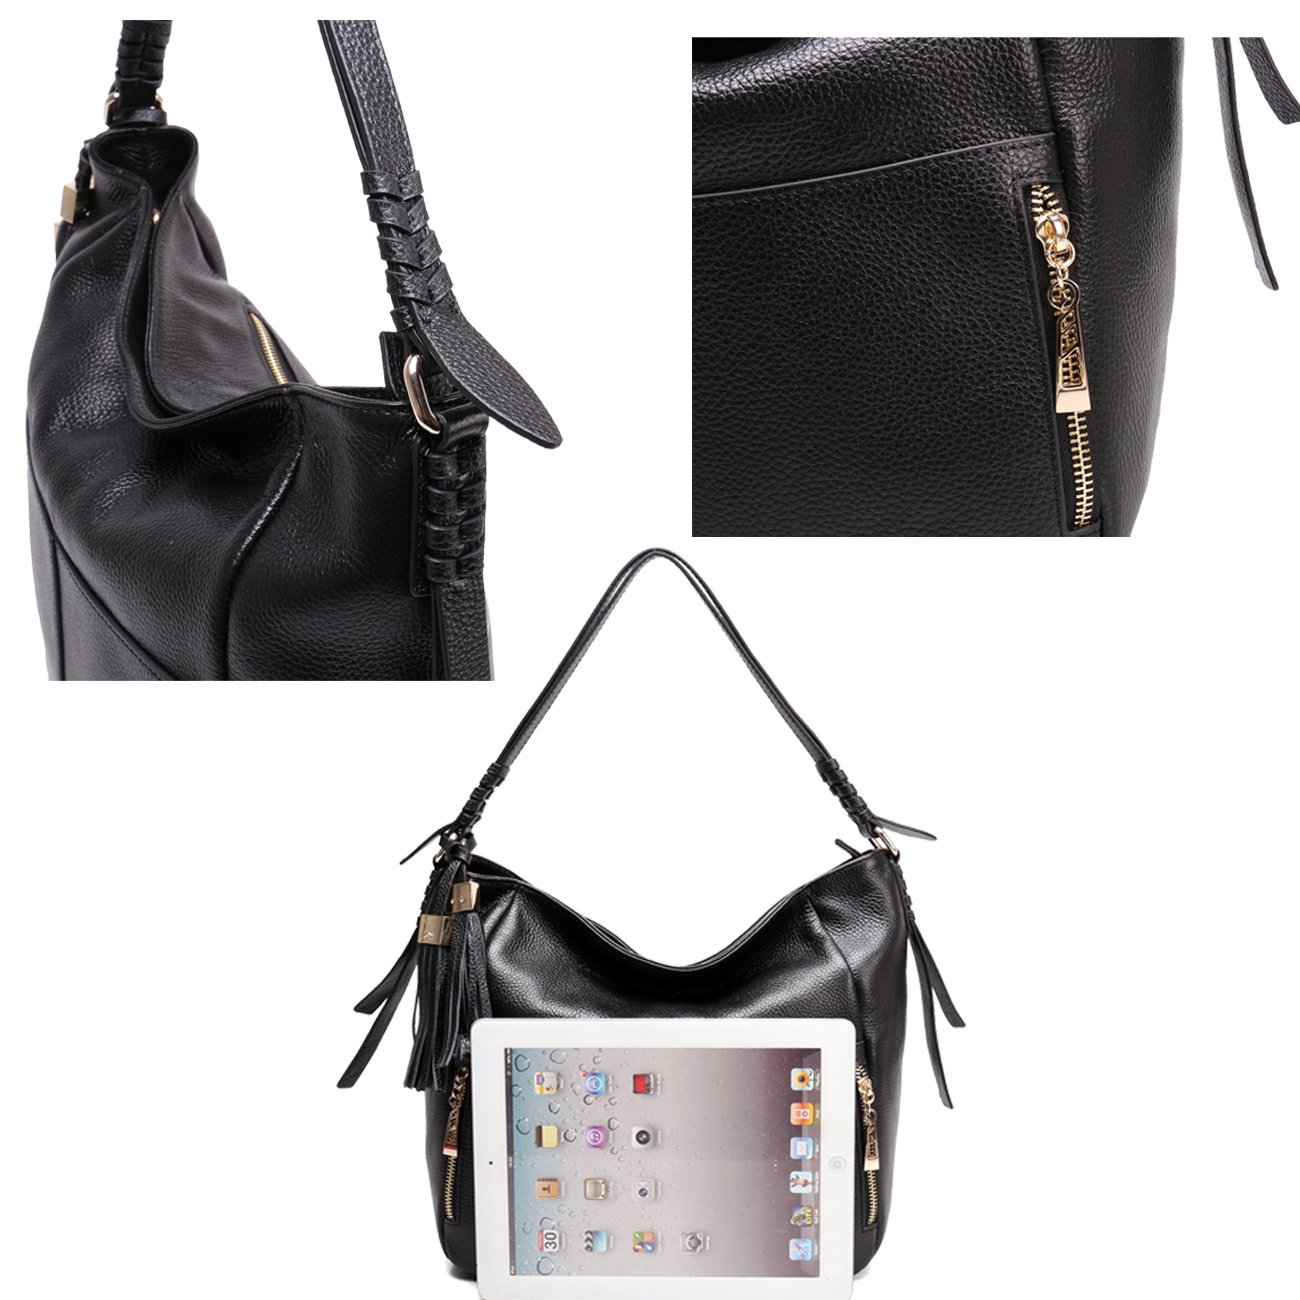 Geya Women's Fashion Genuine Leather Handbag Shoulder Handbag with Imported Soft Hot Leather (Black) by Geya (Image #8)